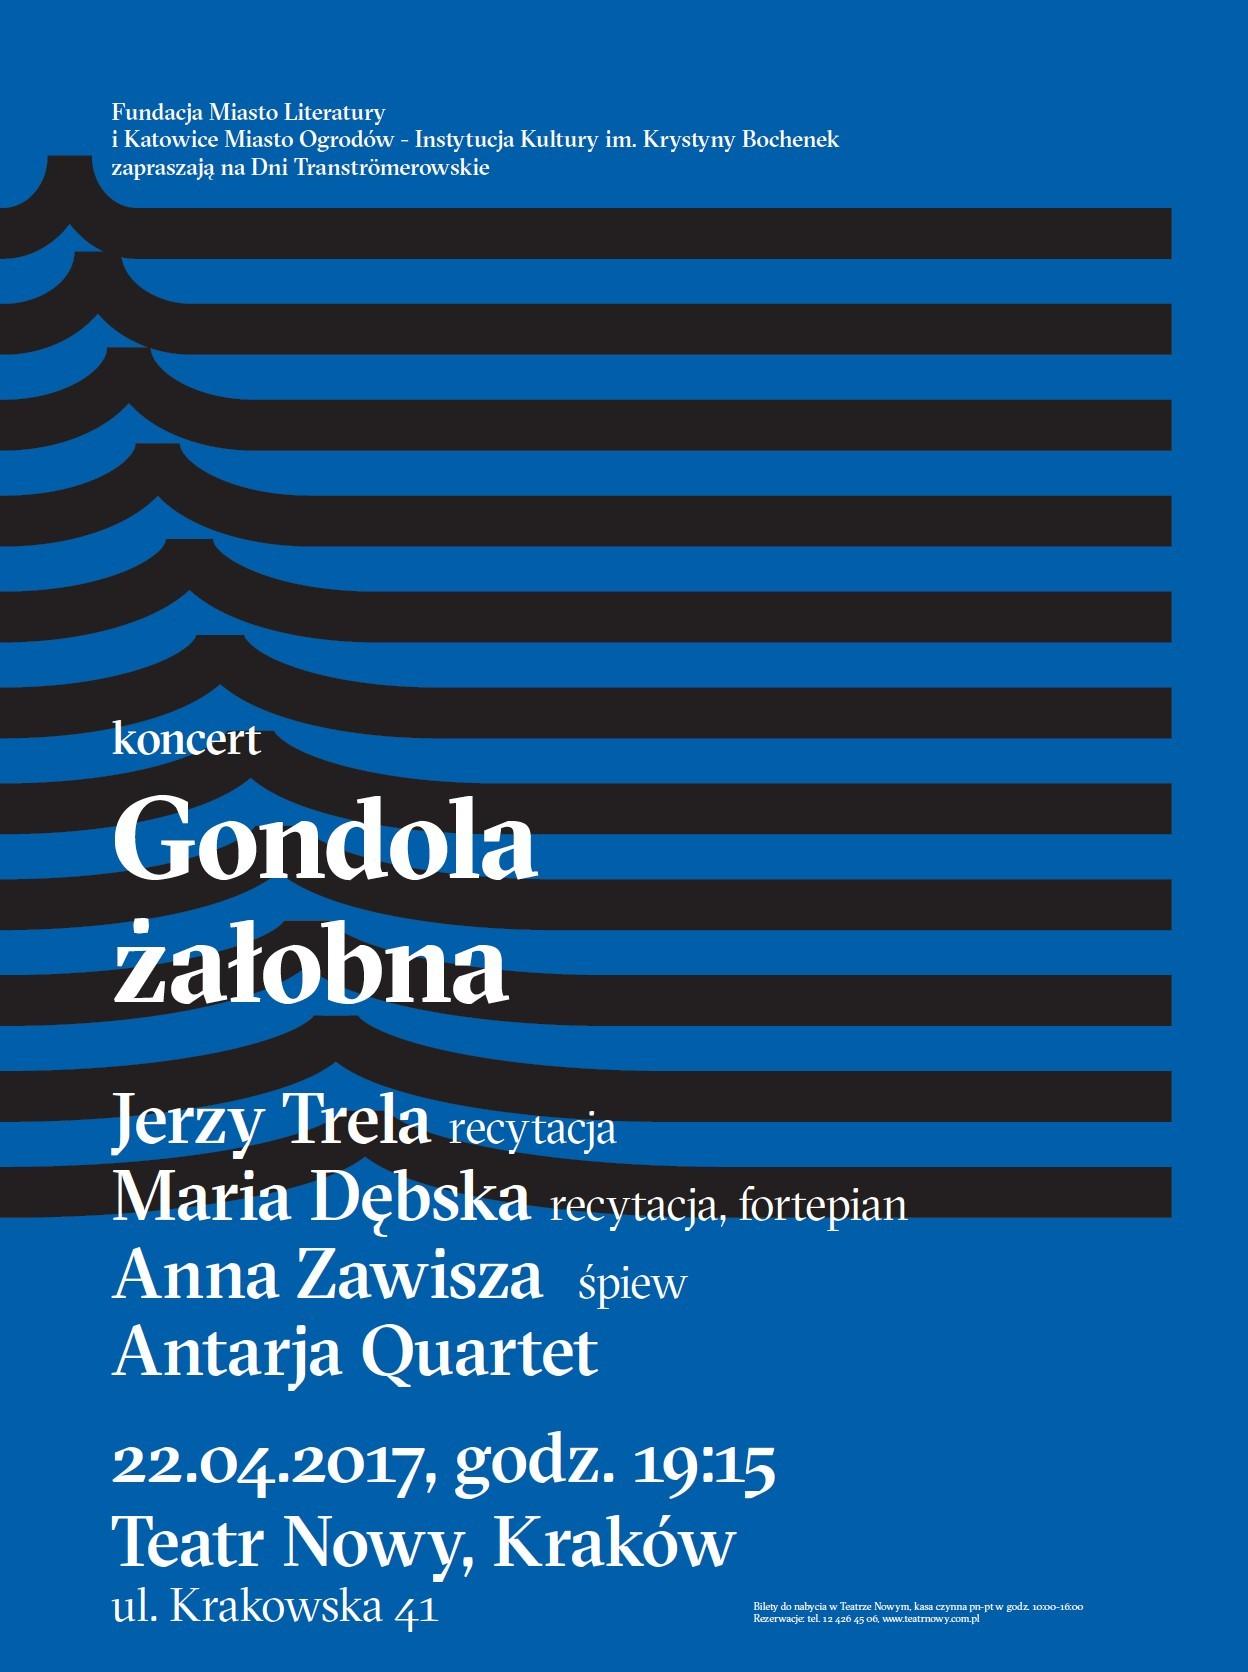 Dni Tranströmerowskie, koncert – plakat (źródło: materiały prasowe)Dni Tranströmerowskie, koncert w Krakowie – plakat (źródło: materiały prasowe)